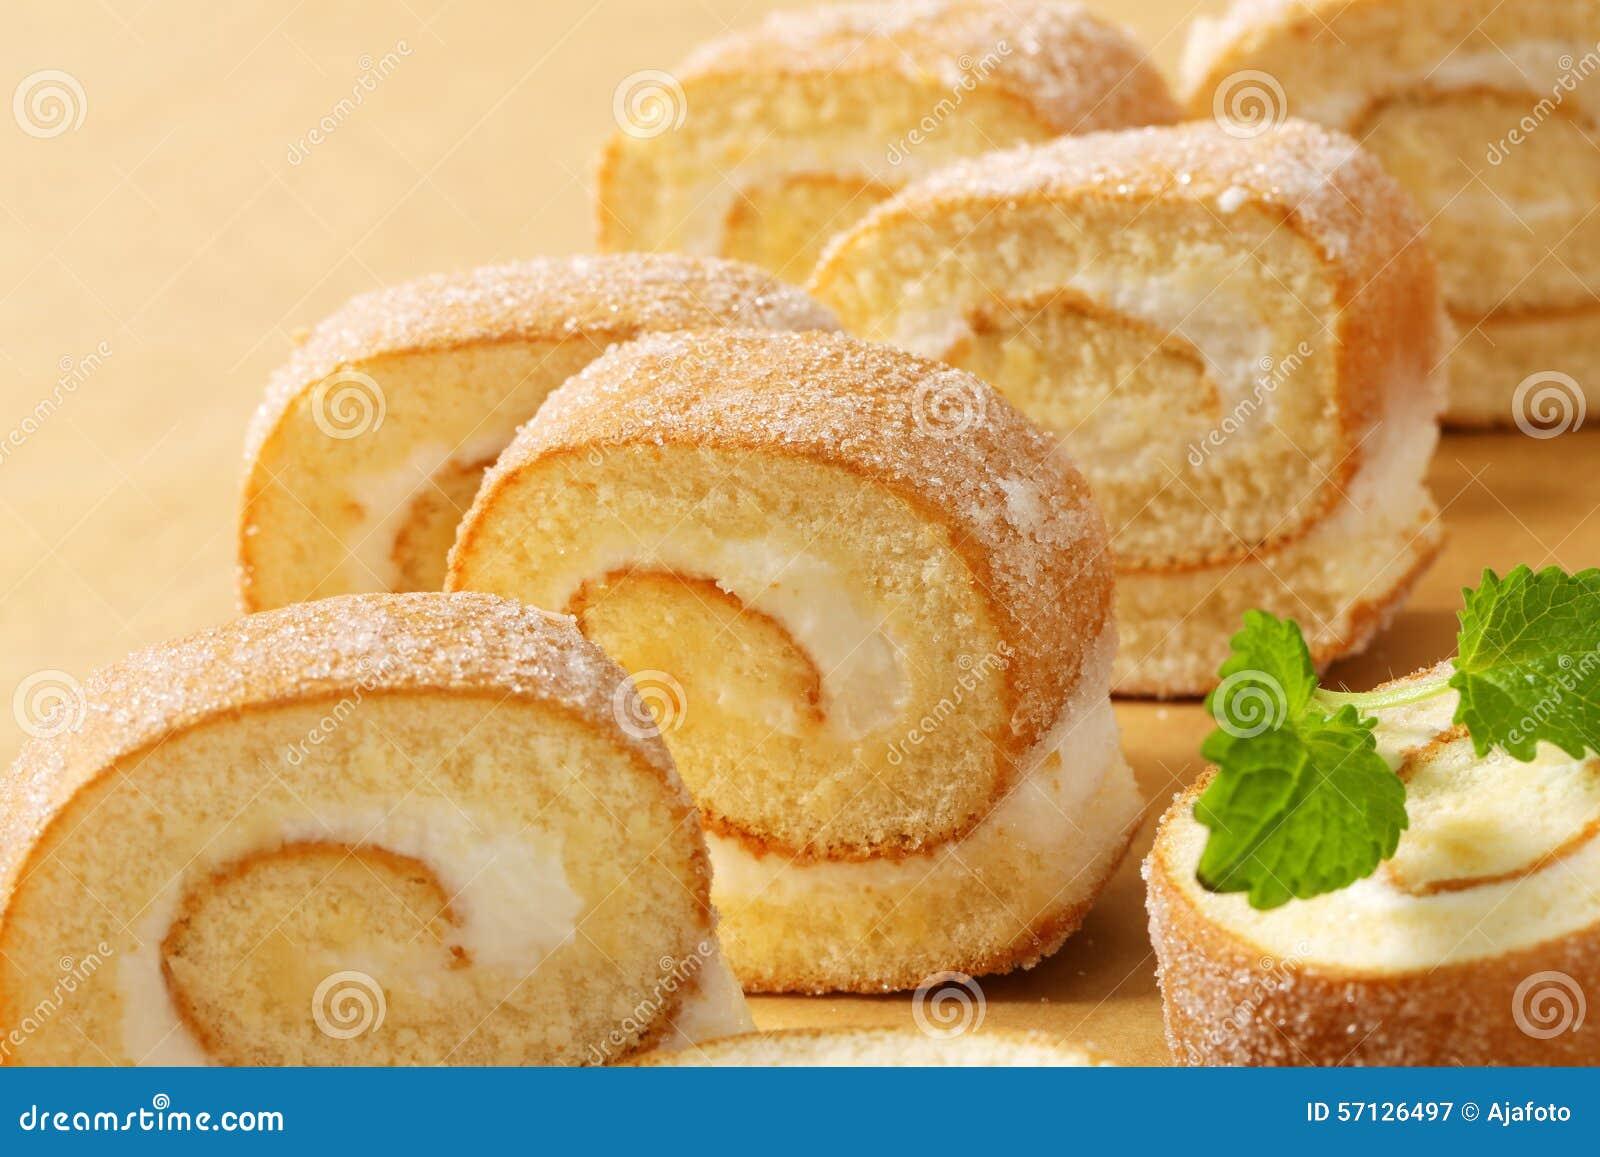 How To Make Sponge Roll Cake